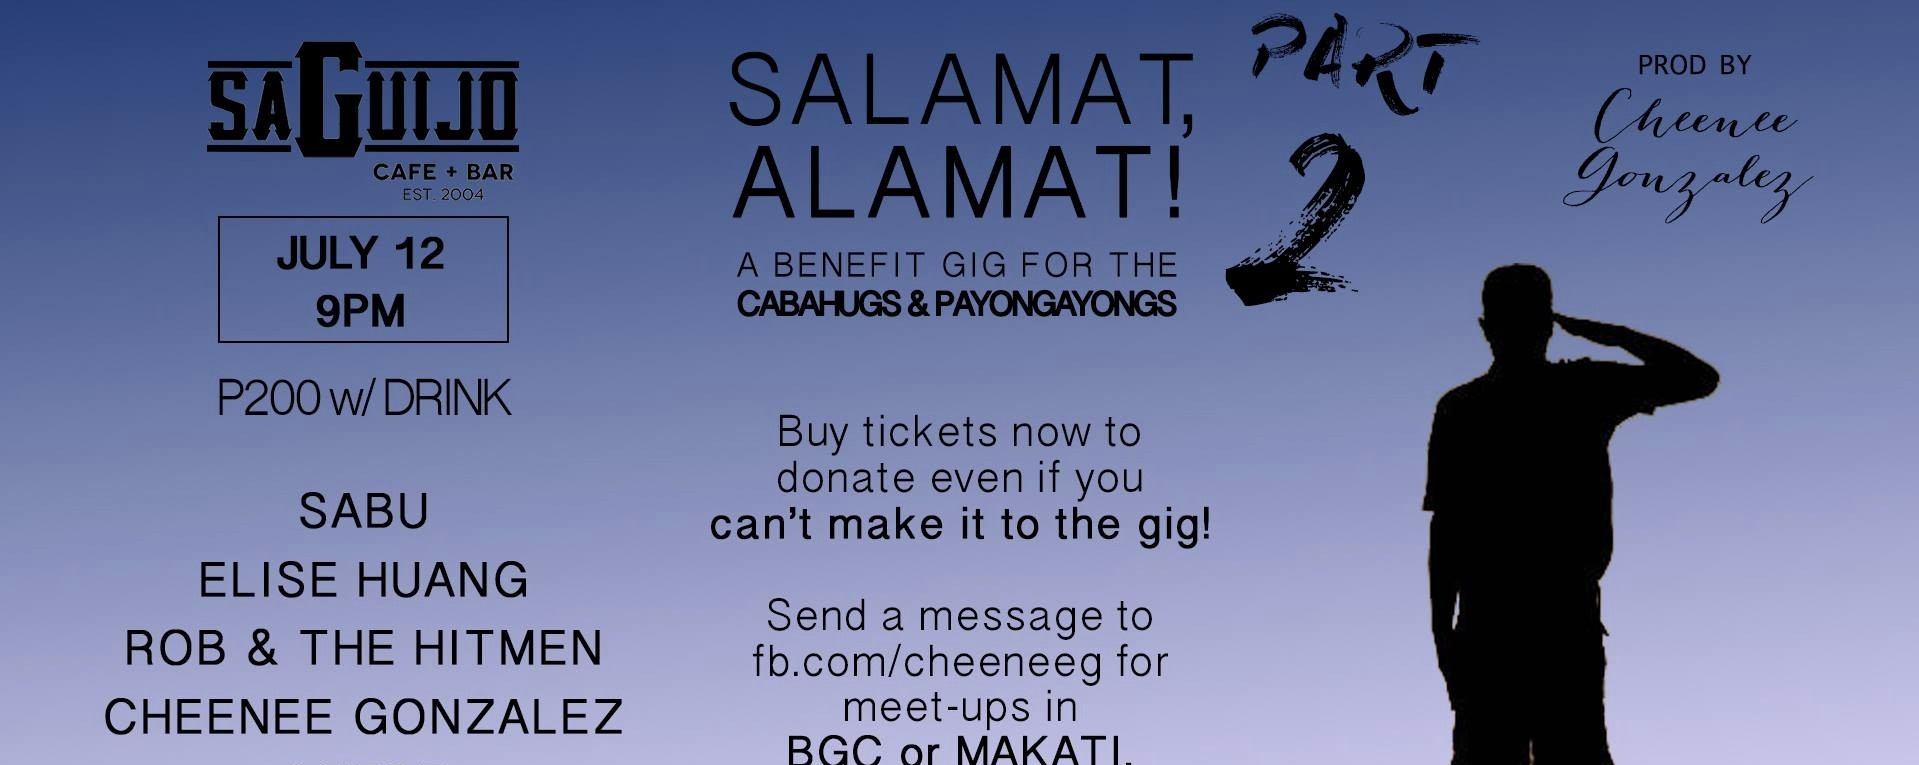 Salamat,Alamat! 2: A Benefit Gig for the Cabahugs & Payongayongs